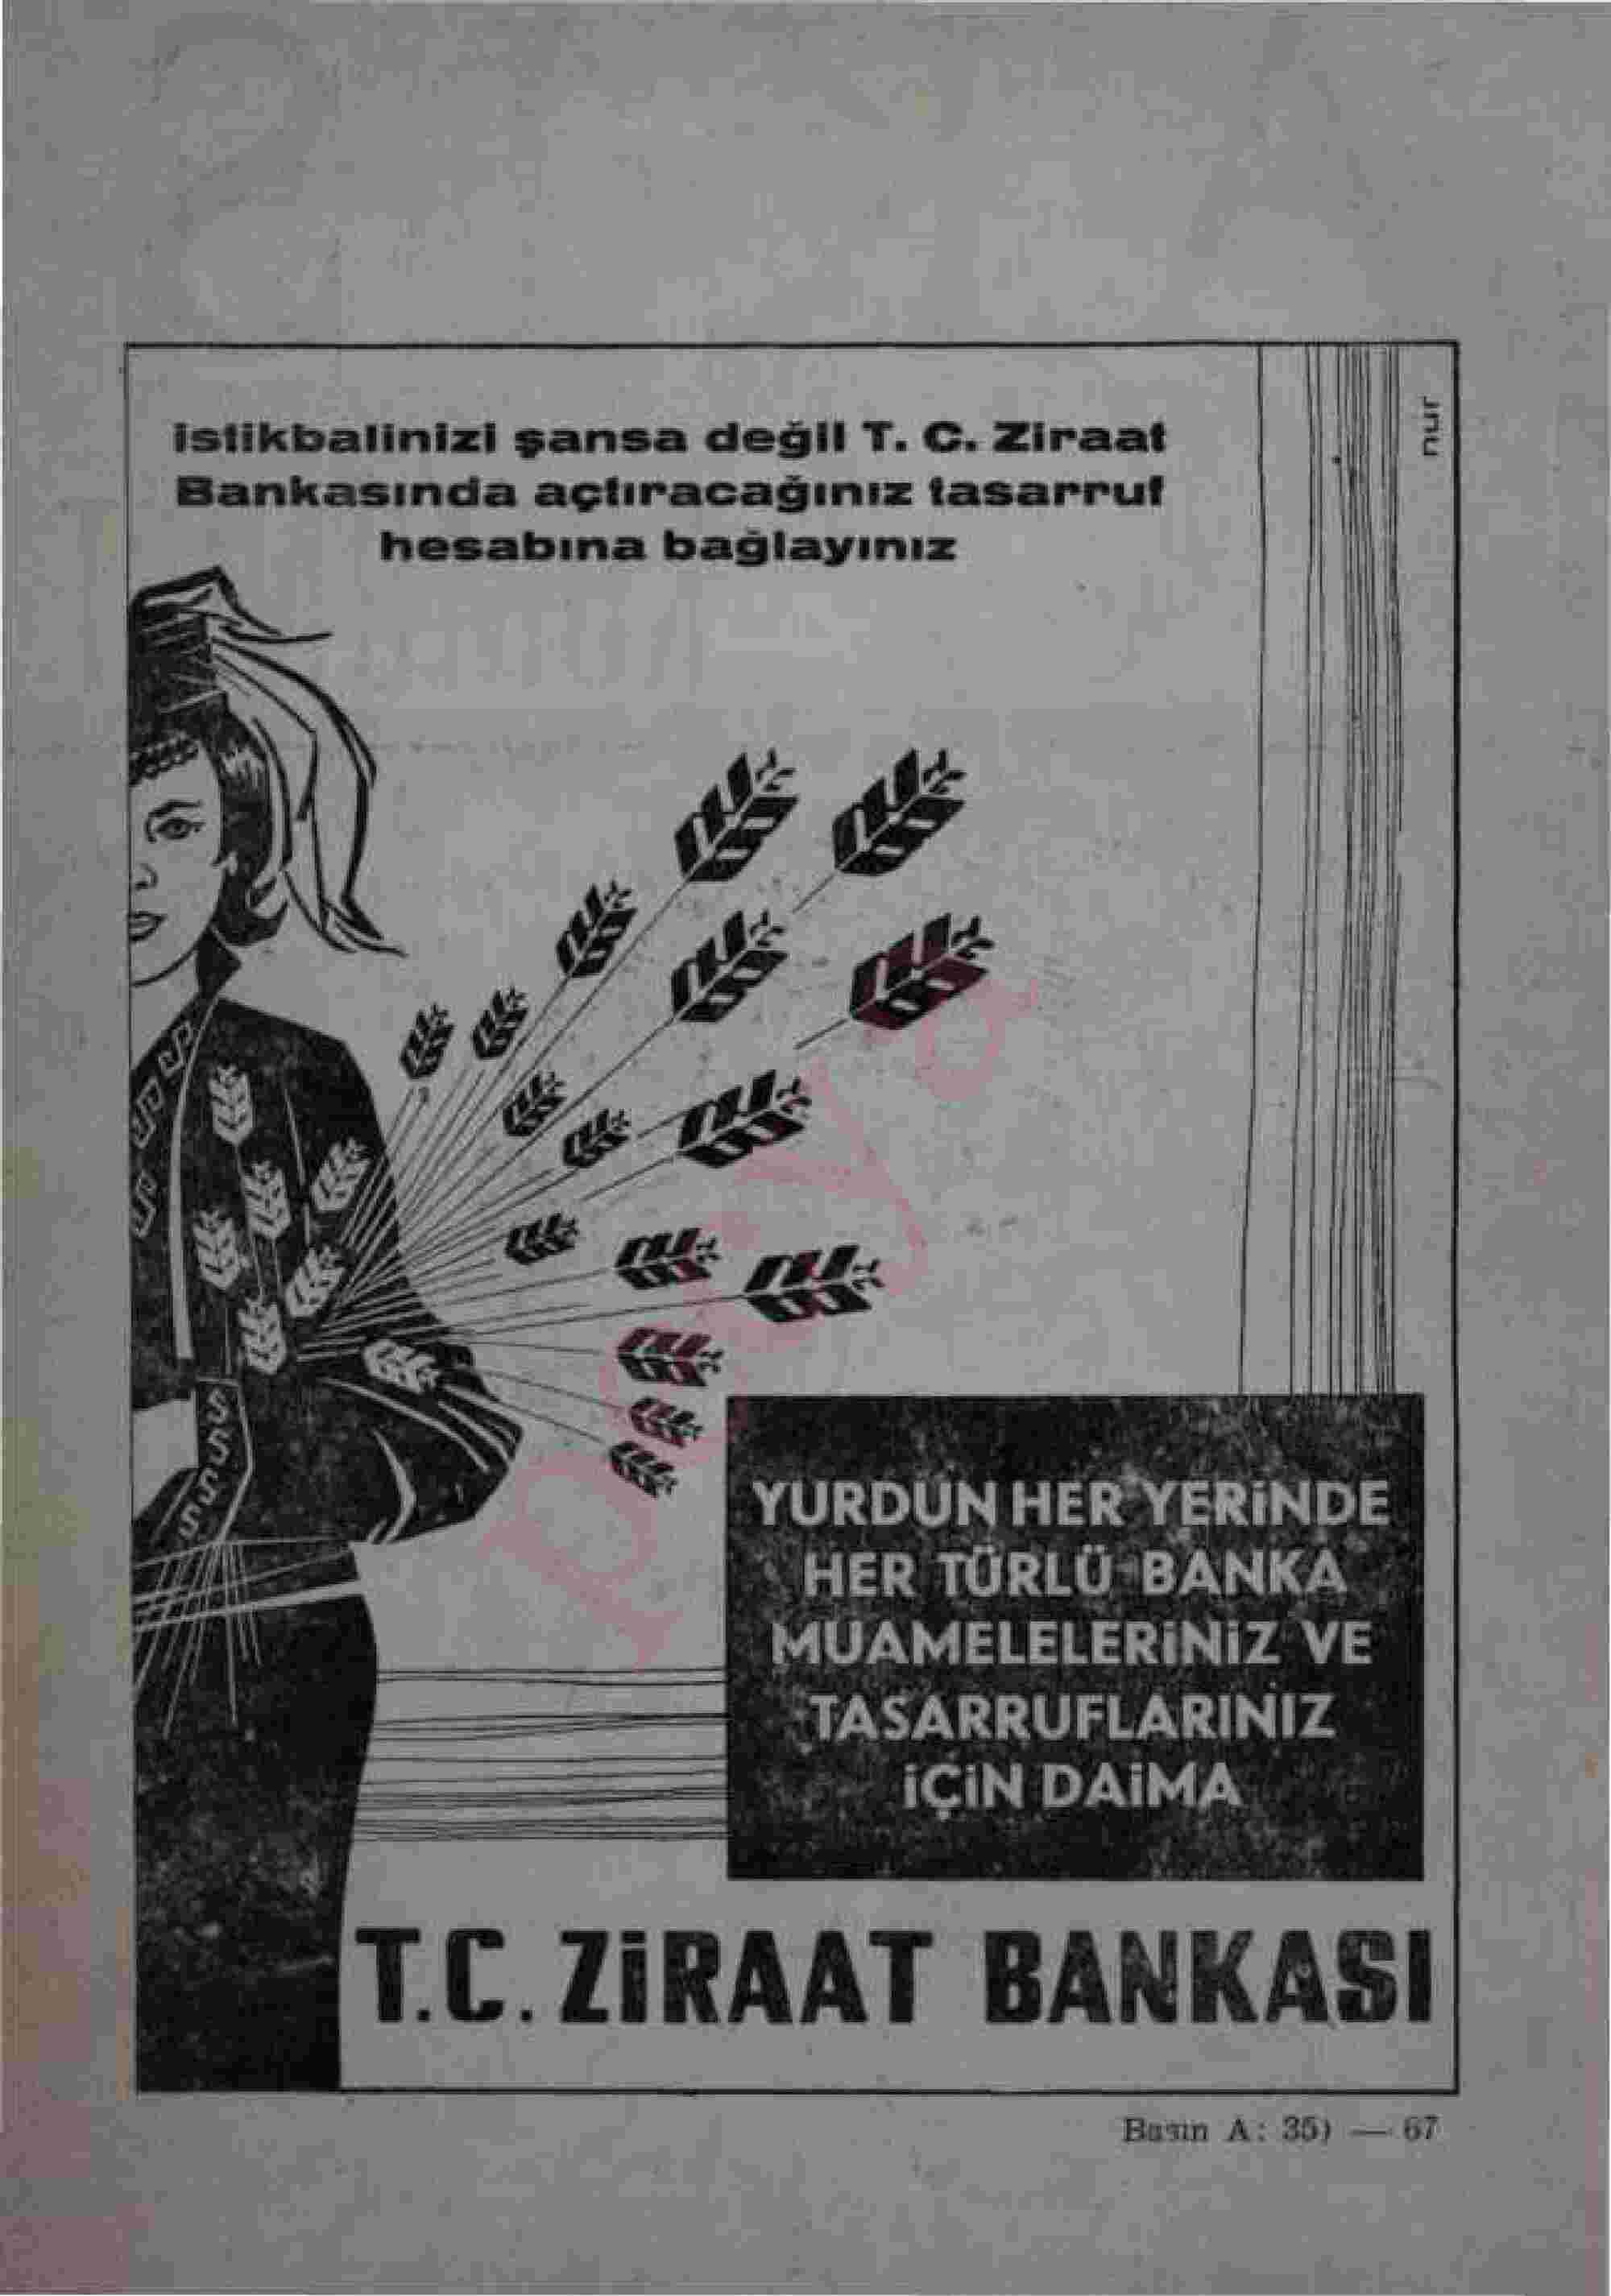 19 Mart 1966 tarihli Akis Dergisi Sayfa 2